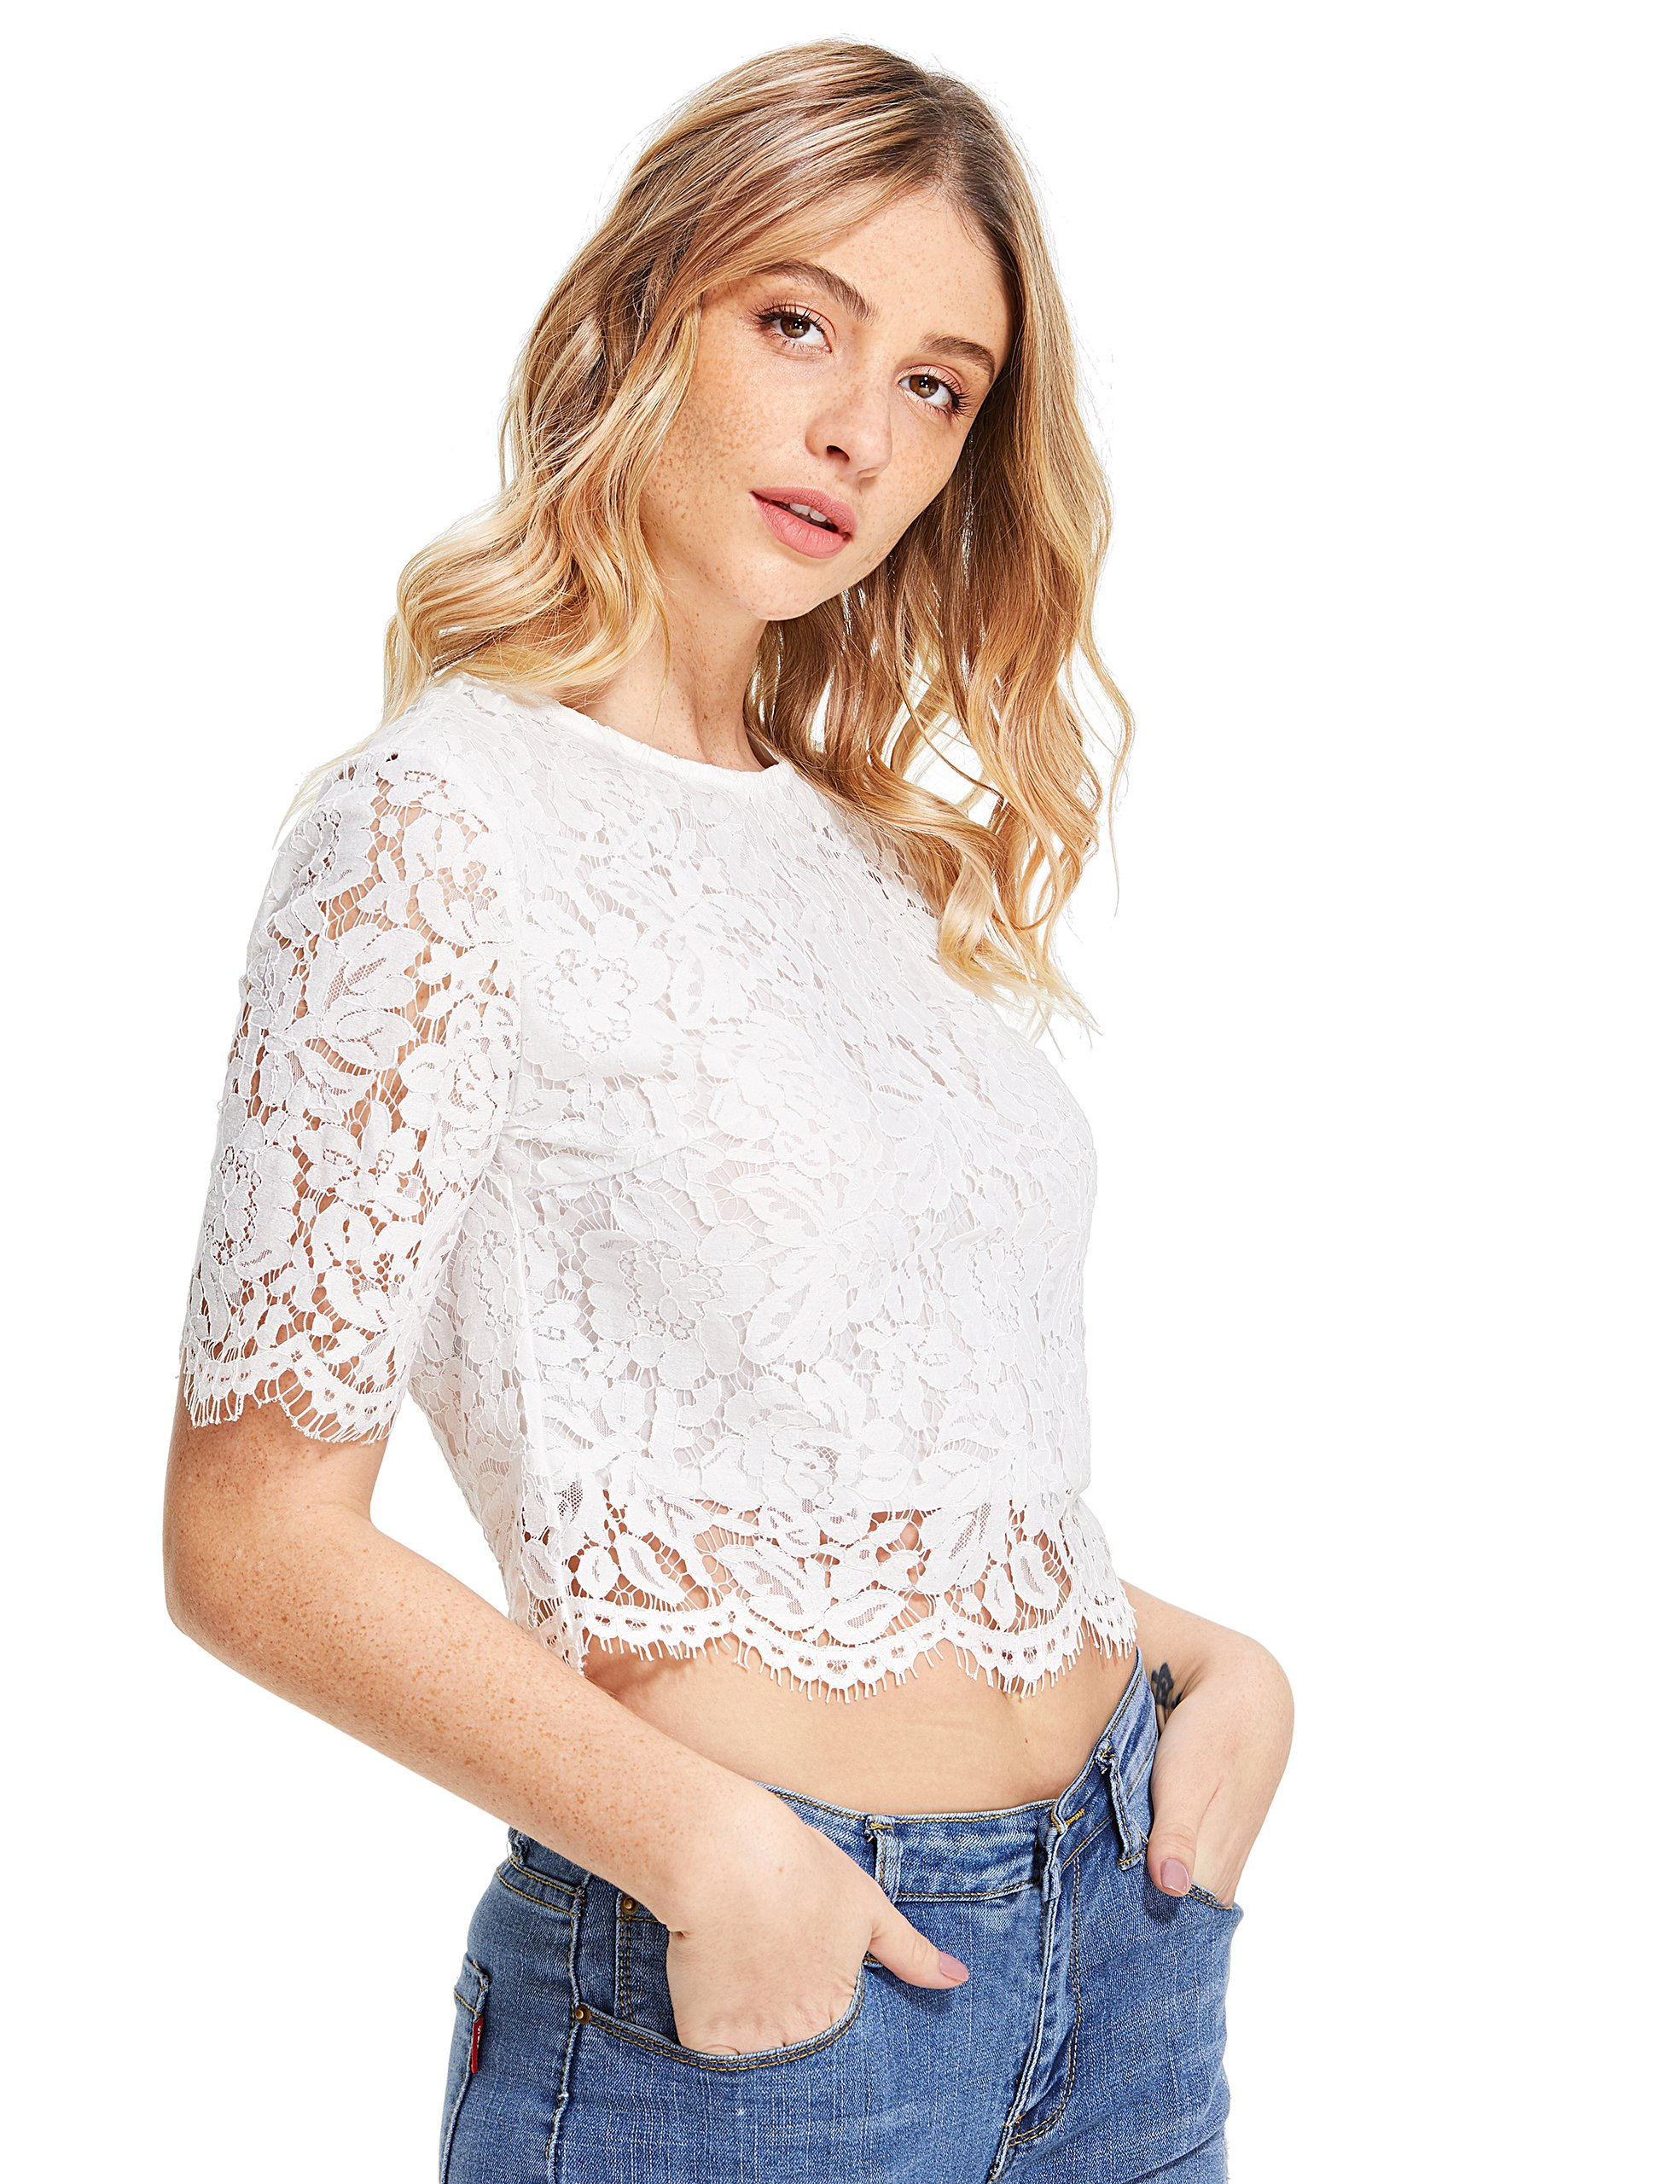 d7c50cf8cd MakeMeChic Women s Short Sleeve Sexy Sheer Blouse Mesh Lace Crop Top    Departments   Clothing